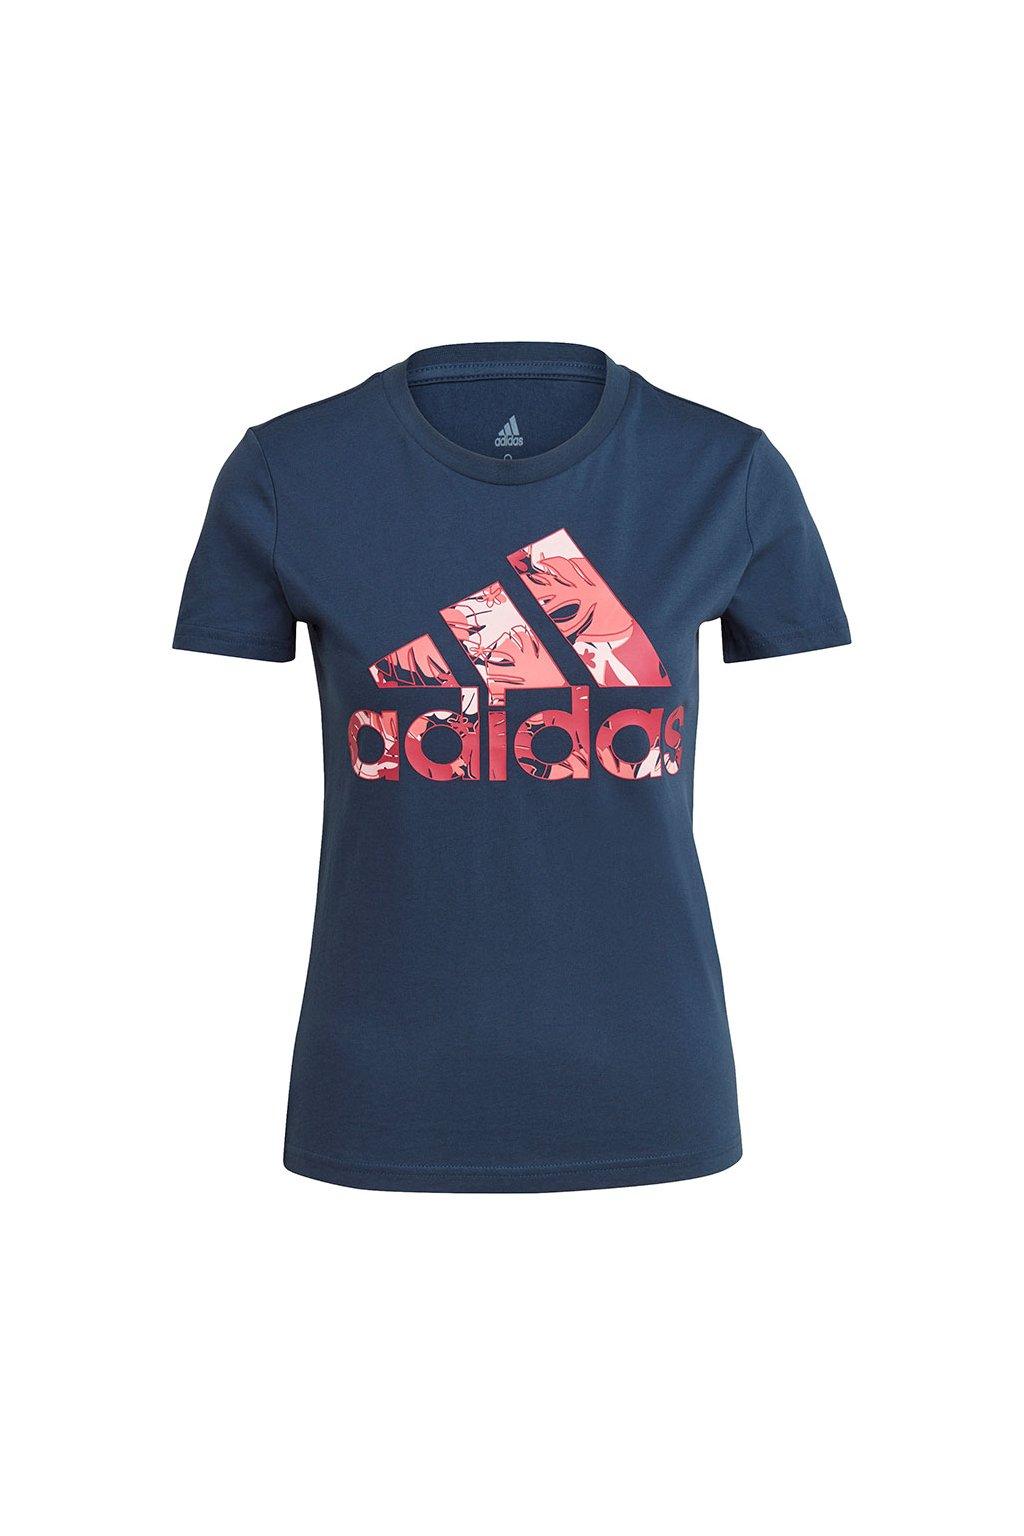 Dámske tričko adidas Tropical Graphic T-Shirt tmavomodré GL0838